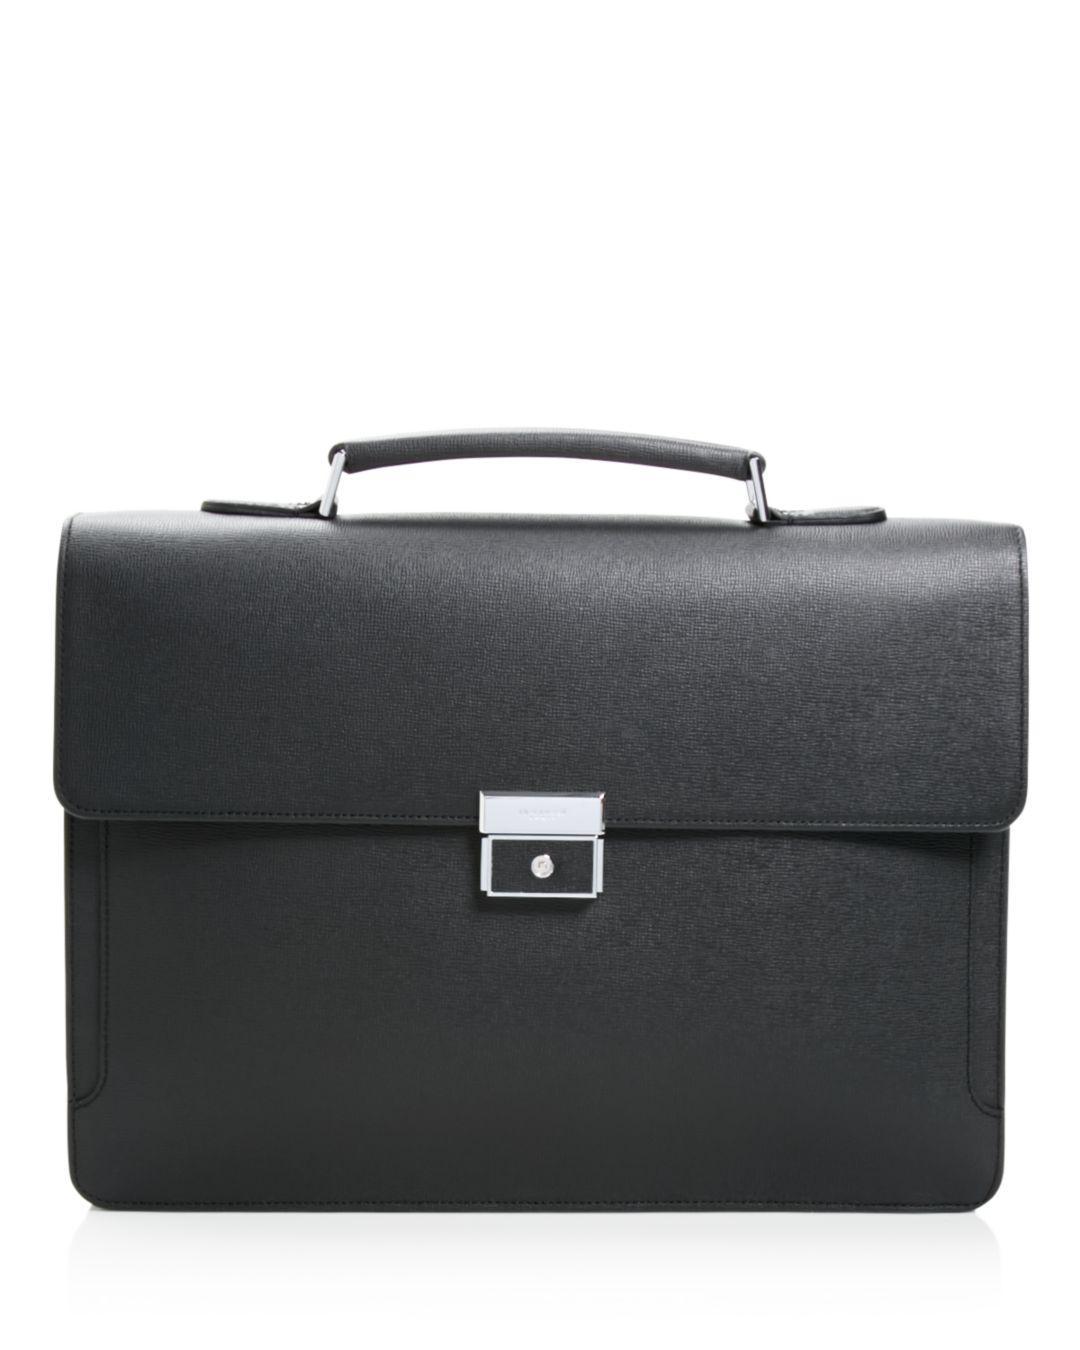 ca141dce3bd6 Lyst - Longchamp Racing Handle Briefcase in Black for Men